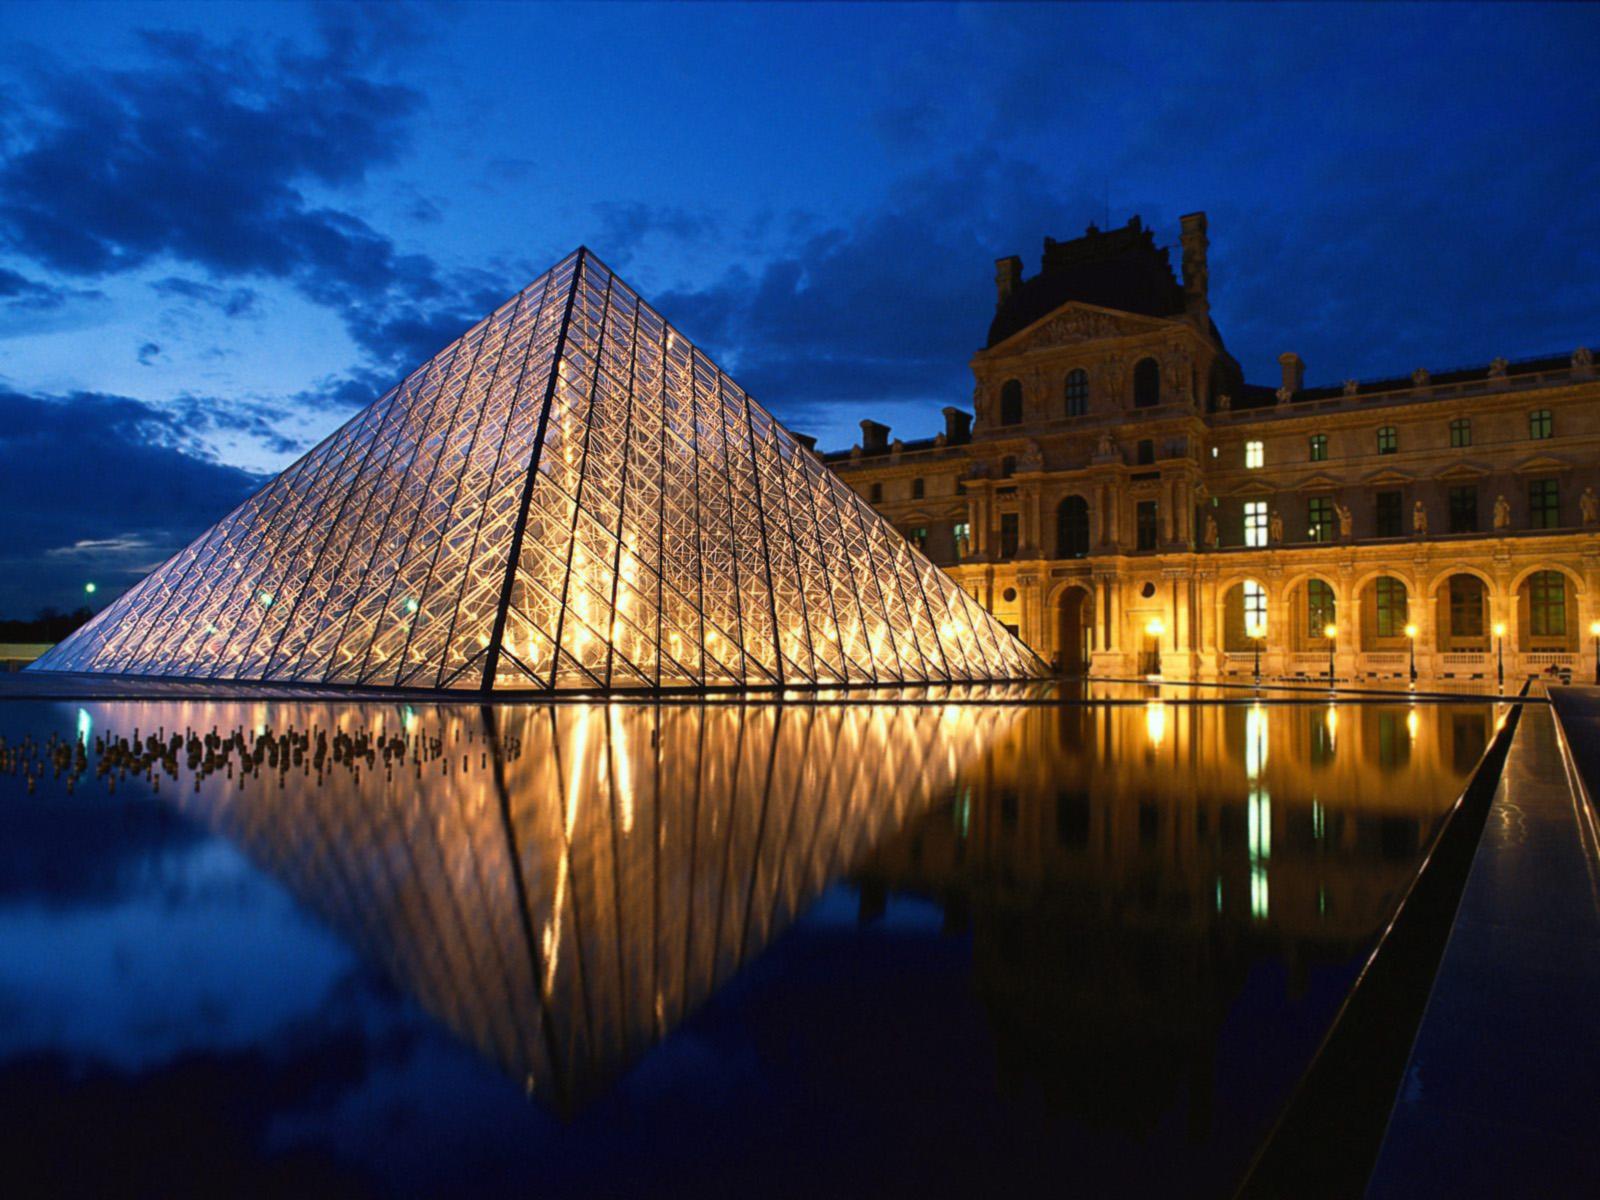 Pyramid-at-Louvre-Museum-Paris-France_1600x1200.jpg